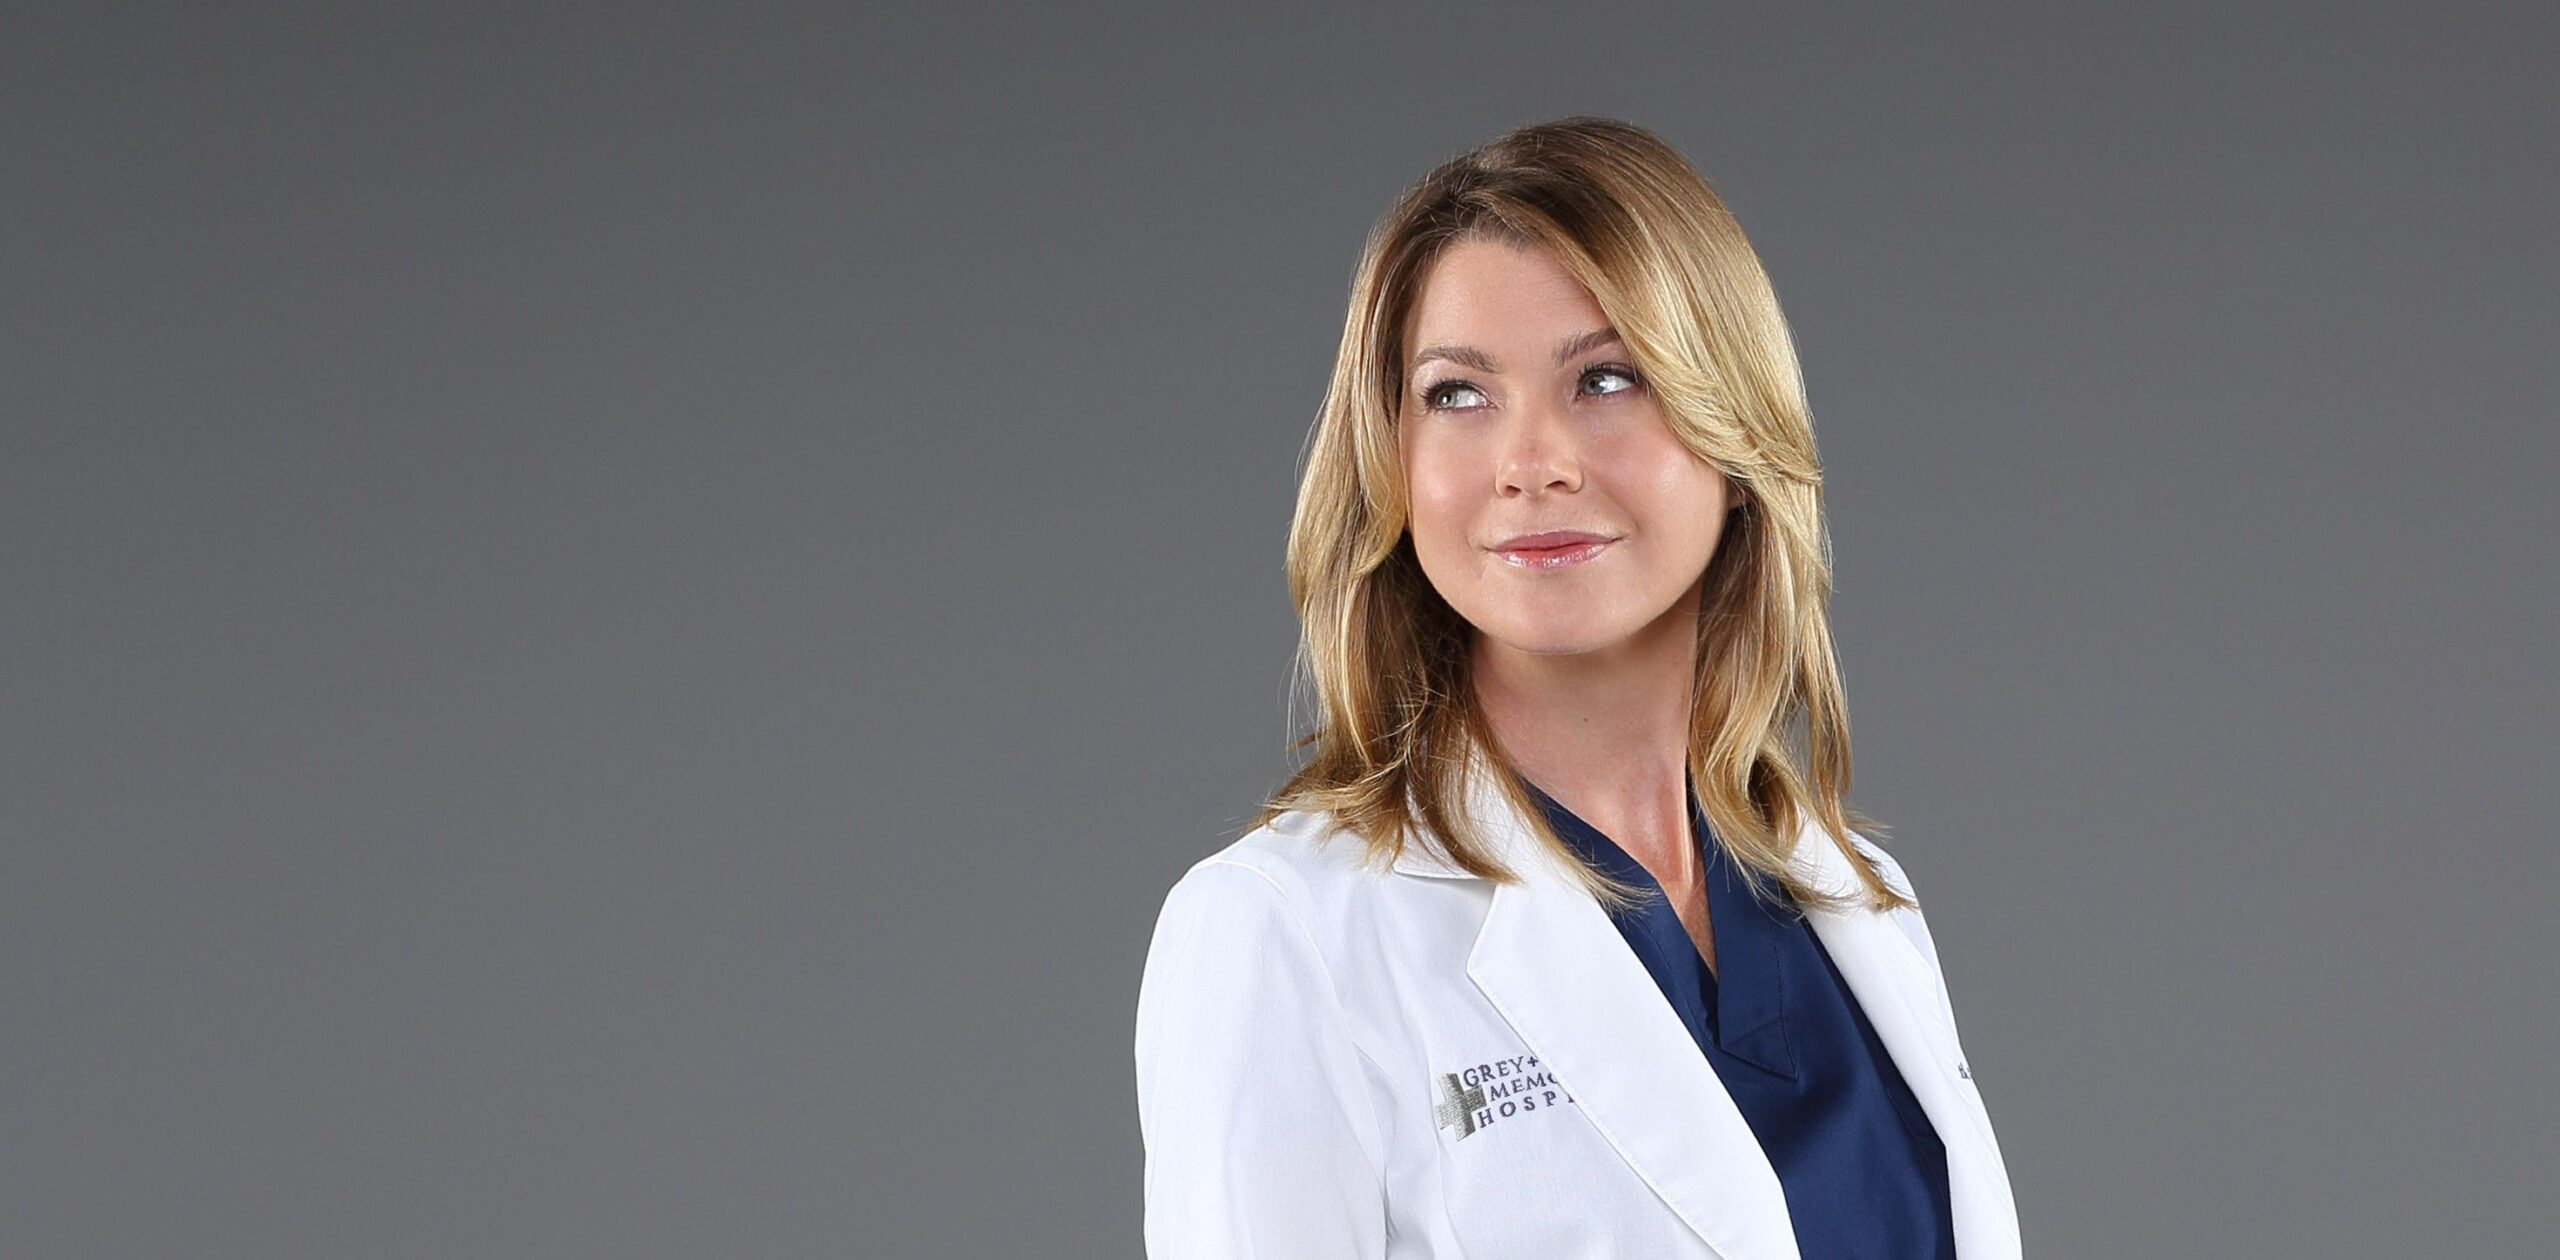 Le 10 filosofie di vita di Meredith Grey